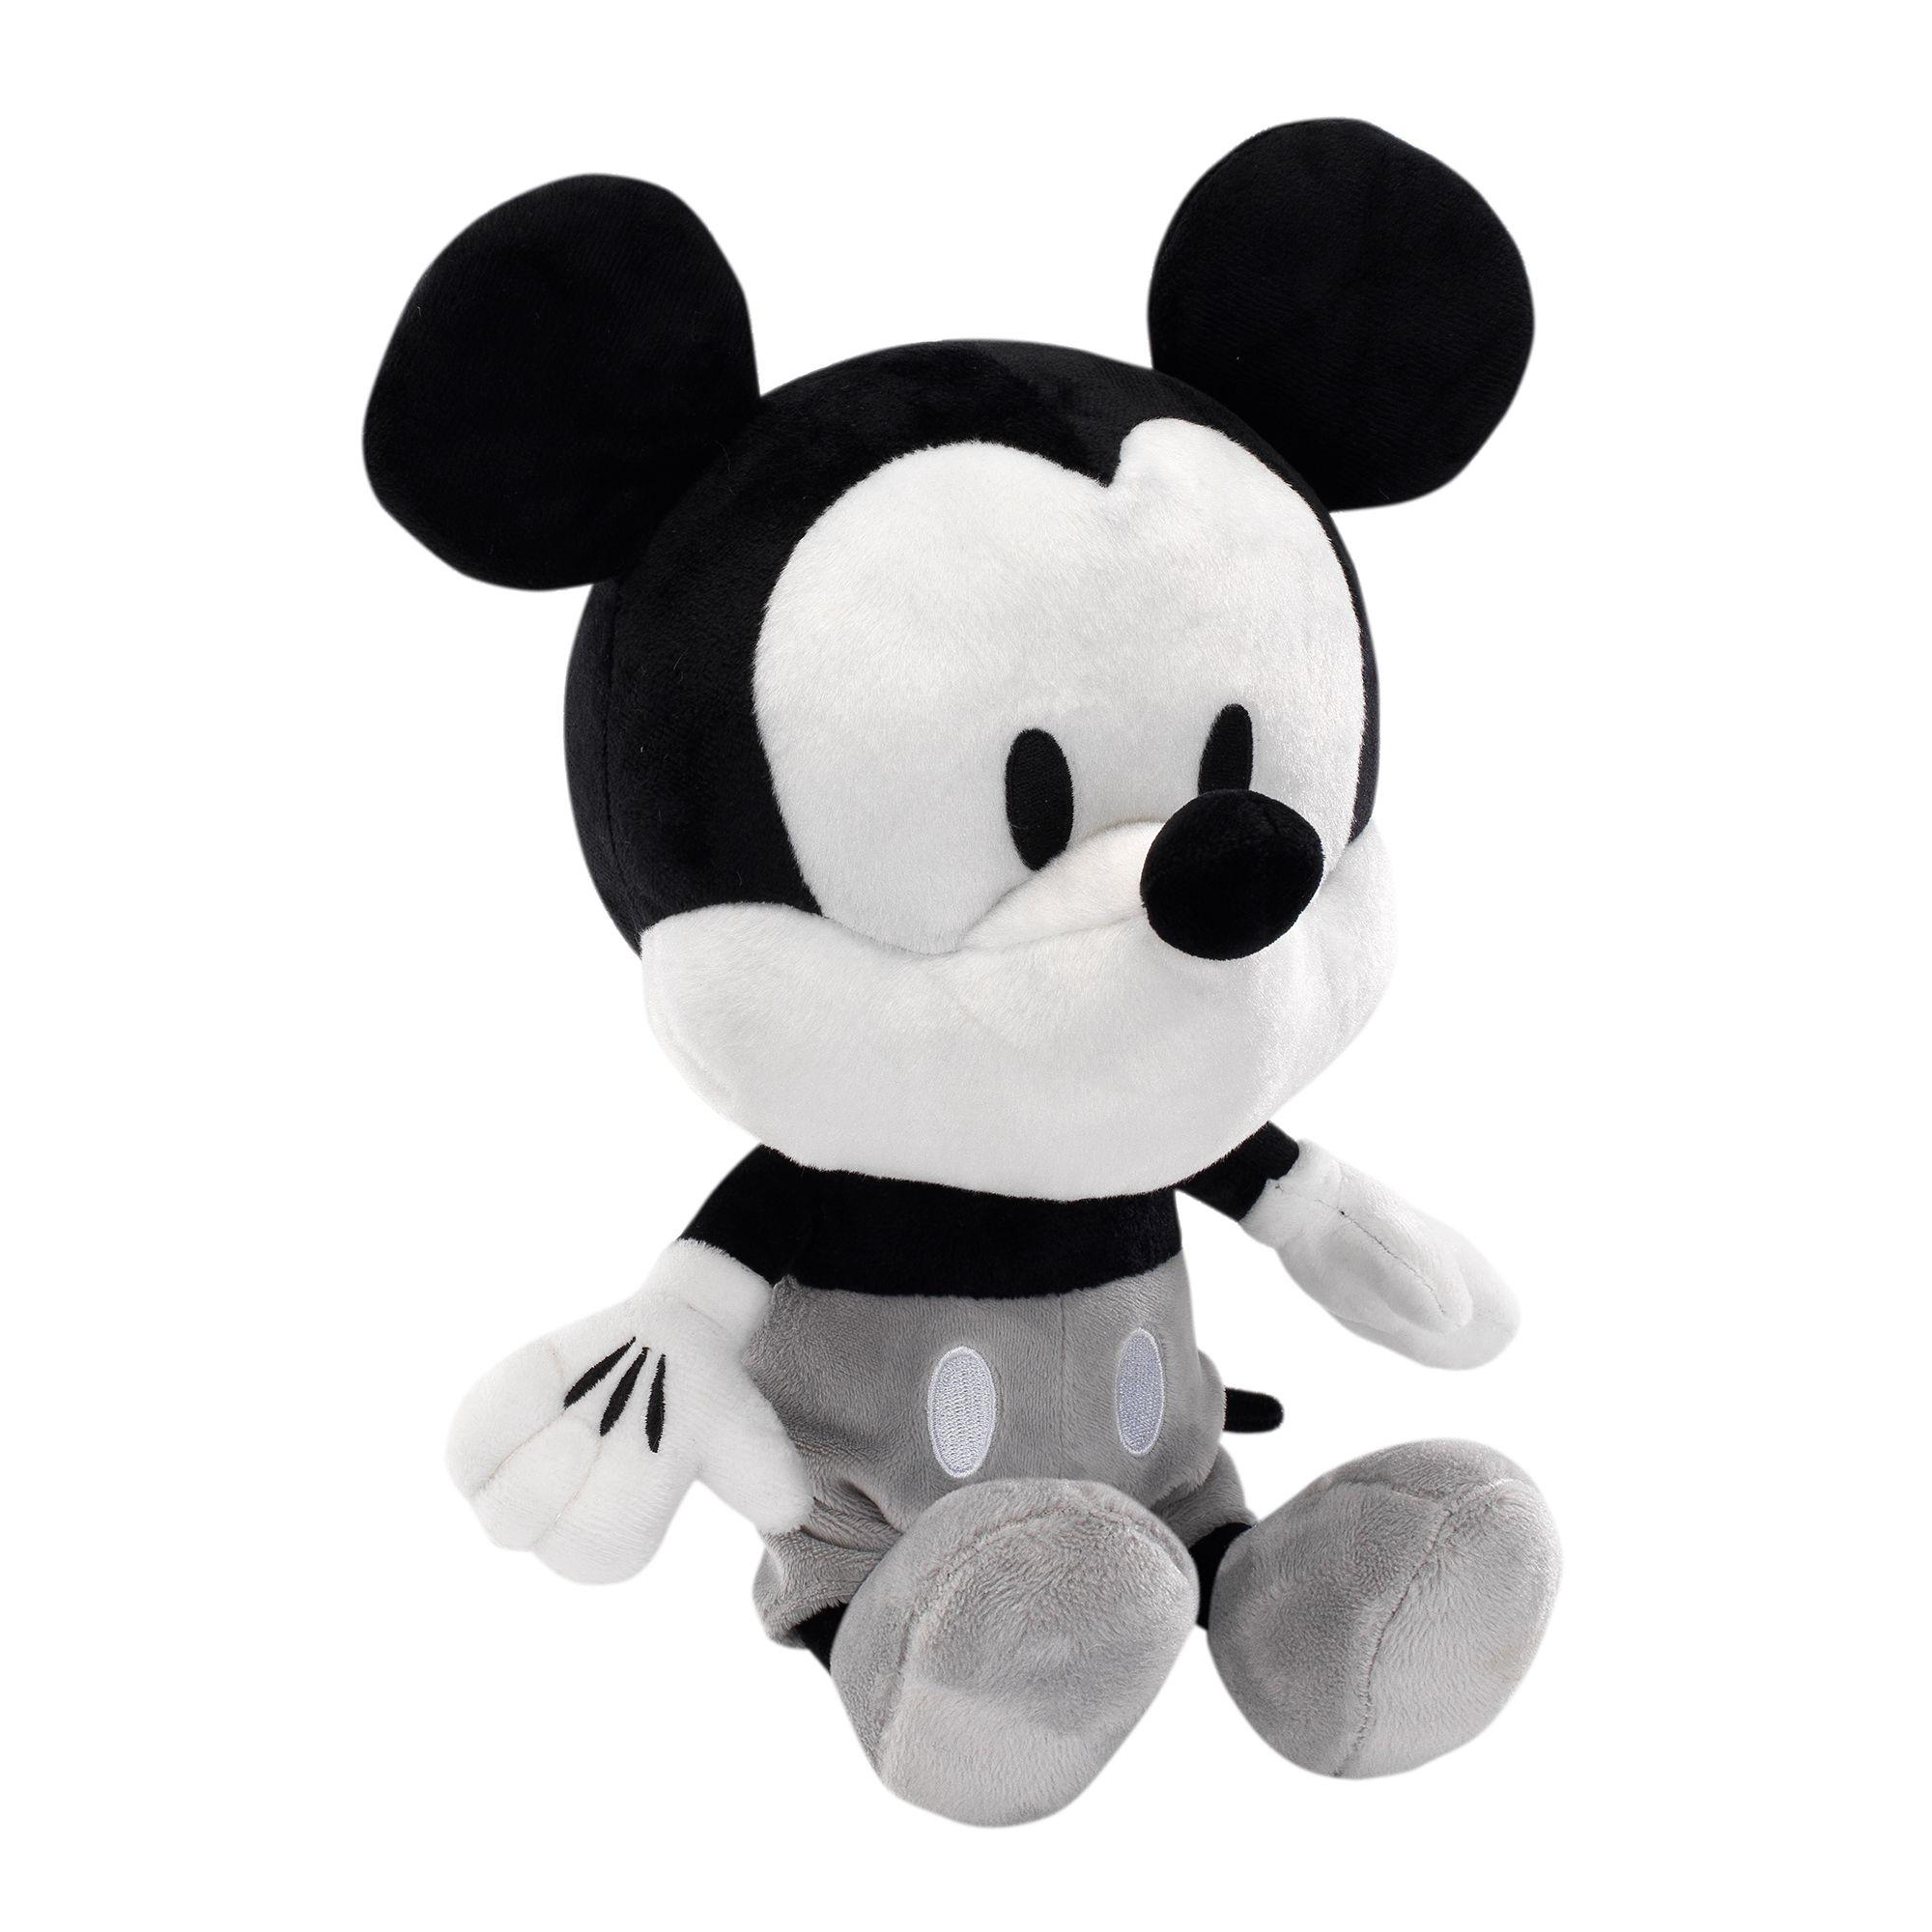 Predownload: Mickey Mouse Plush Mickey Mouse Nursery Baby Stuffed Animals Baby Mickey [ 2000 x 2000 Pixel ]